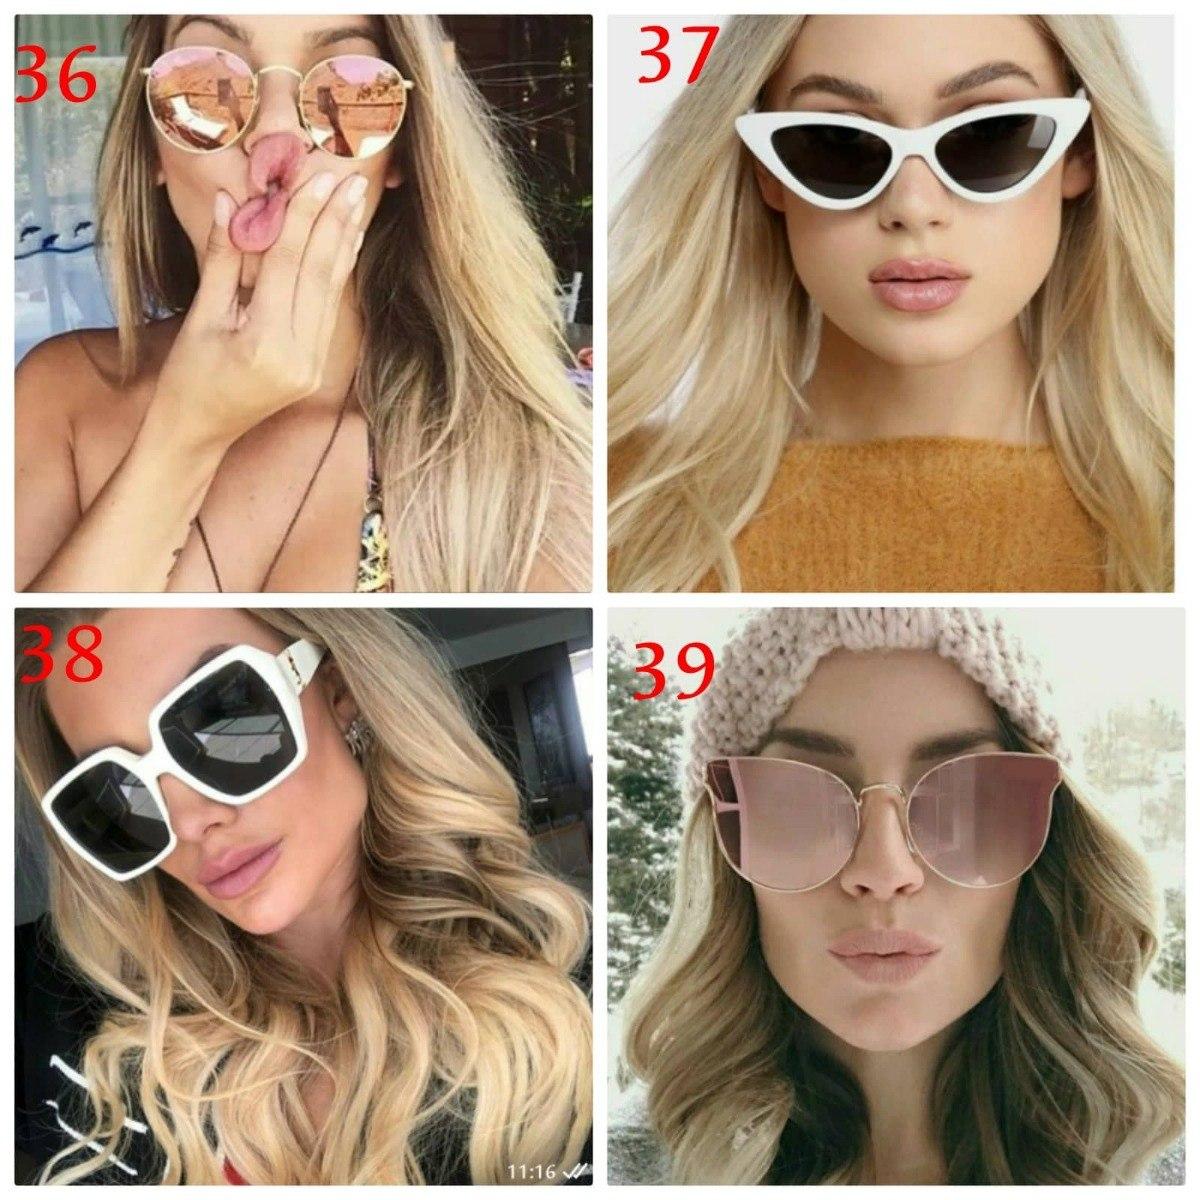 kit 3 óculos de sol feminino estiloso espelhado aviador moda. Carregando  zoom. 566e4195cf